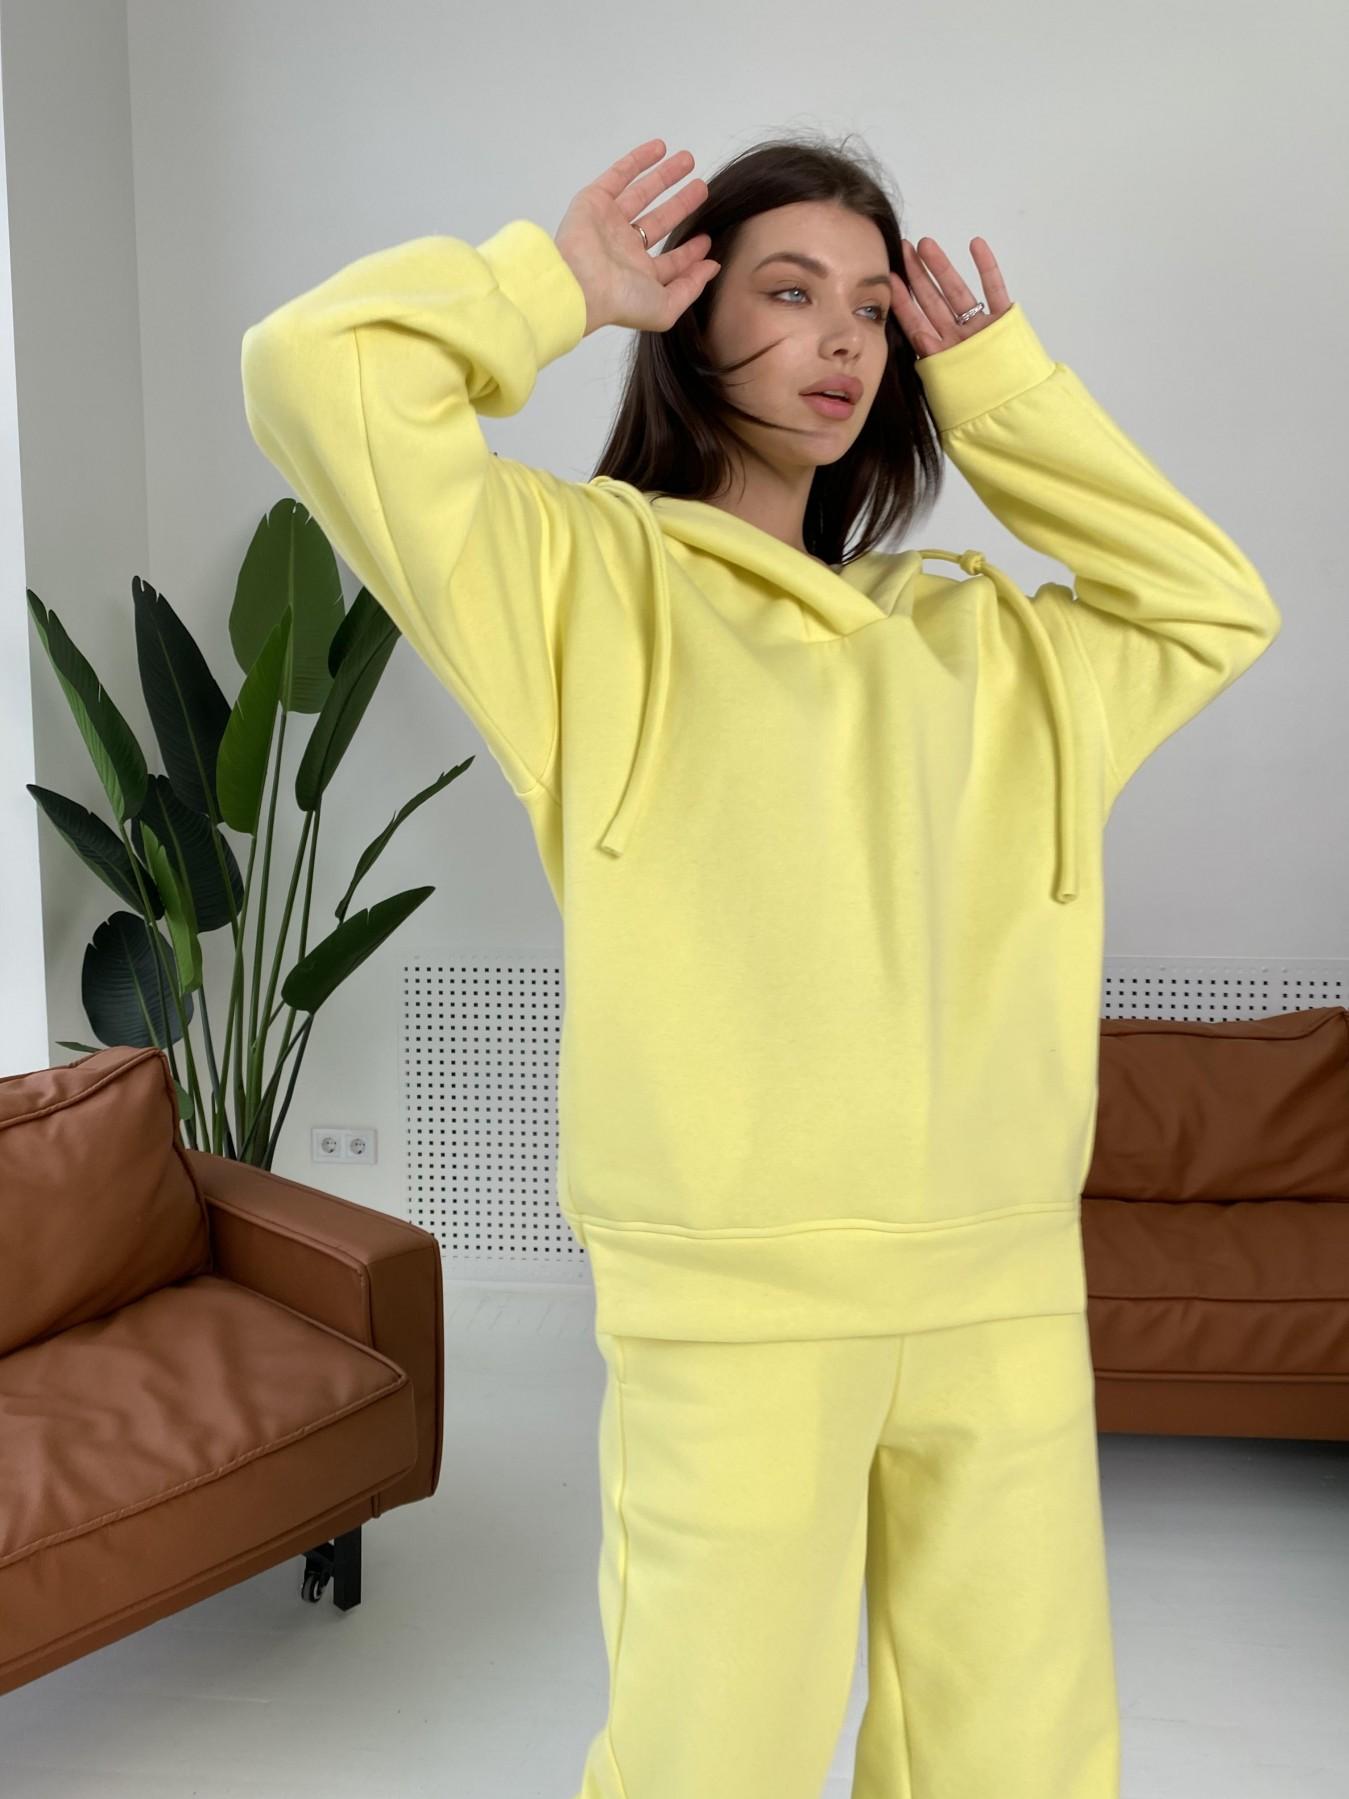 Ярис костюм из 3х нитки 10789 АРТ. 47259 Цвет: Лимон - фото 5, интернет магазин tm-modus.ru